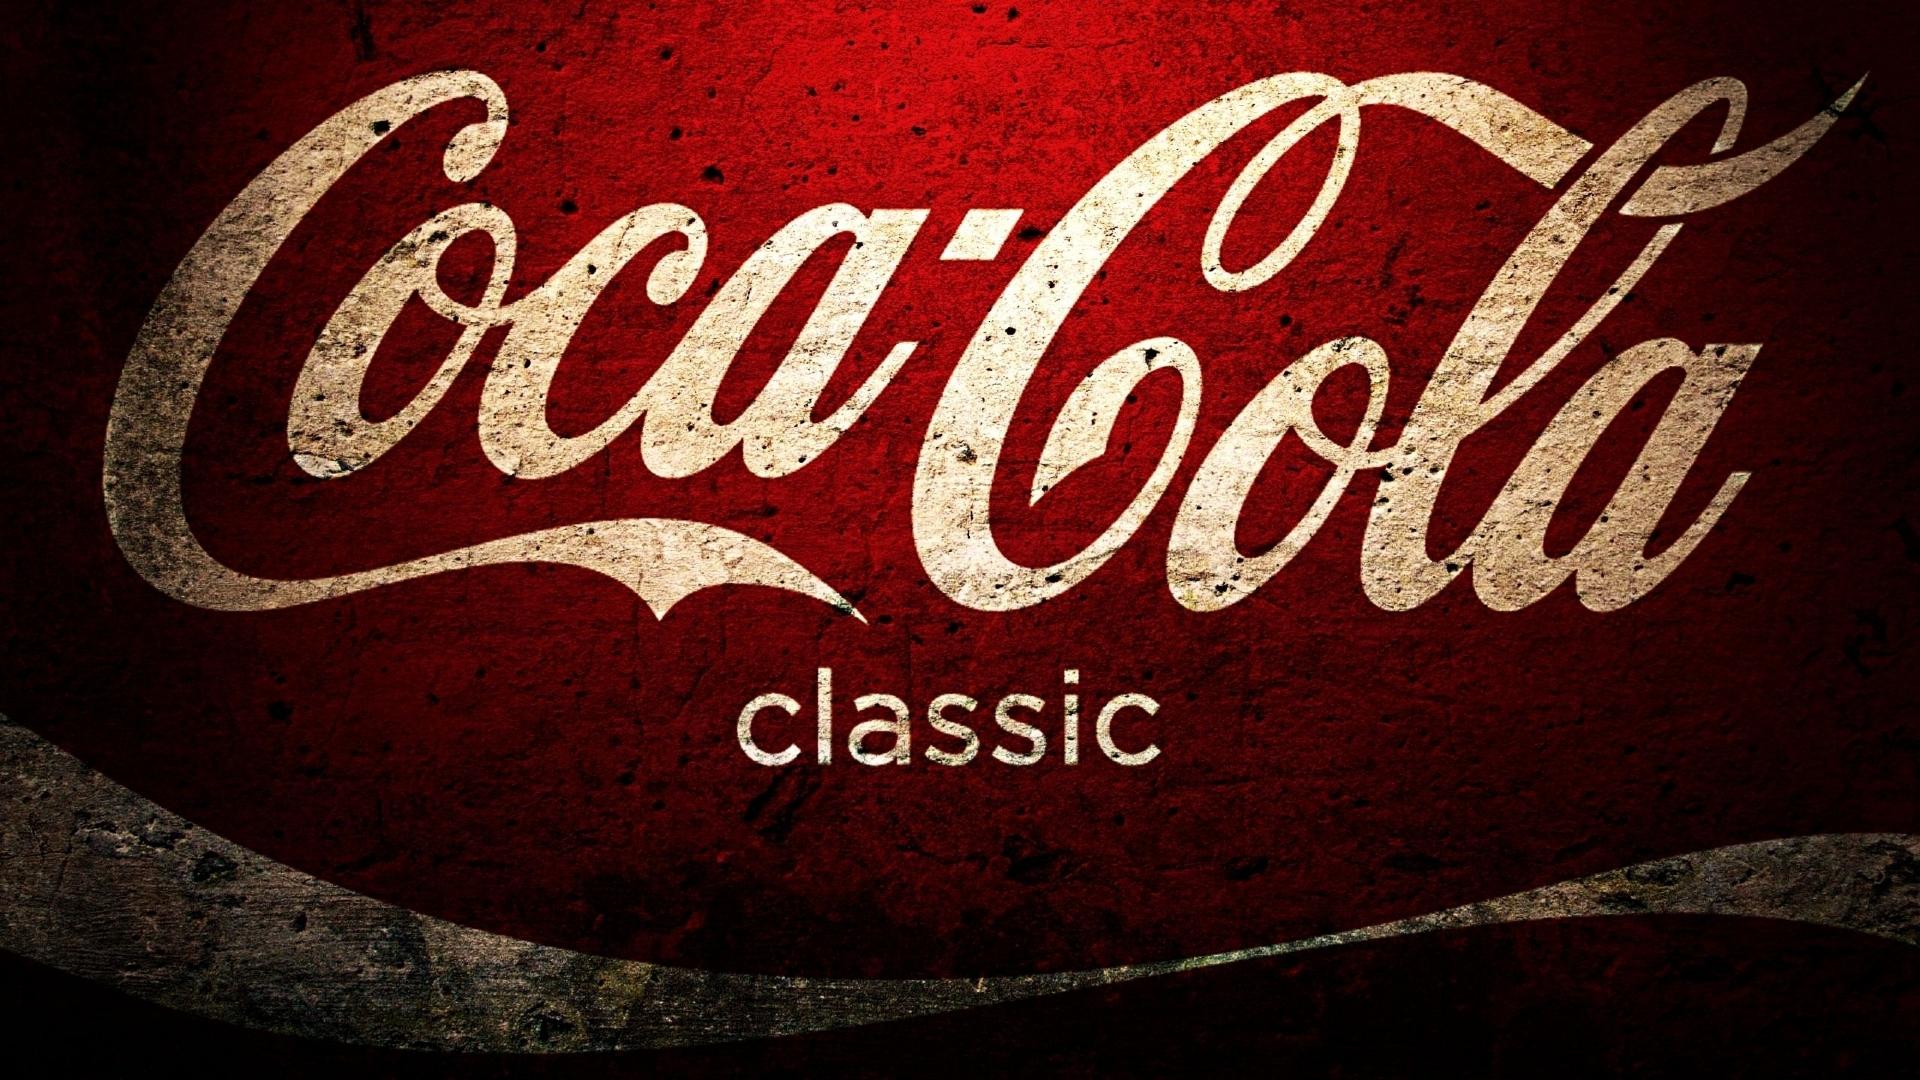 0-Coca_Cola_Classic_1920x1080